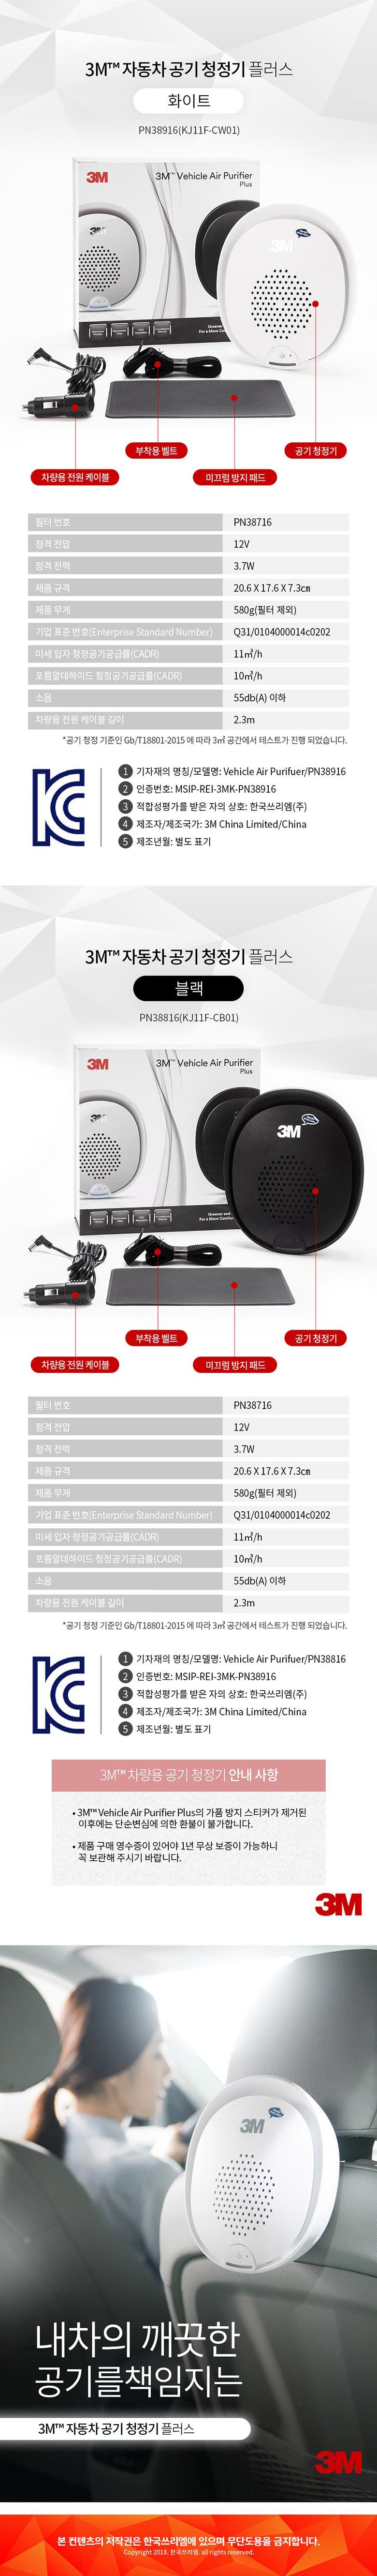 3M 자동차공기청정기 플러스/차량공기청정기 - 엠알오마트